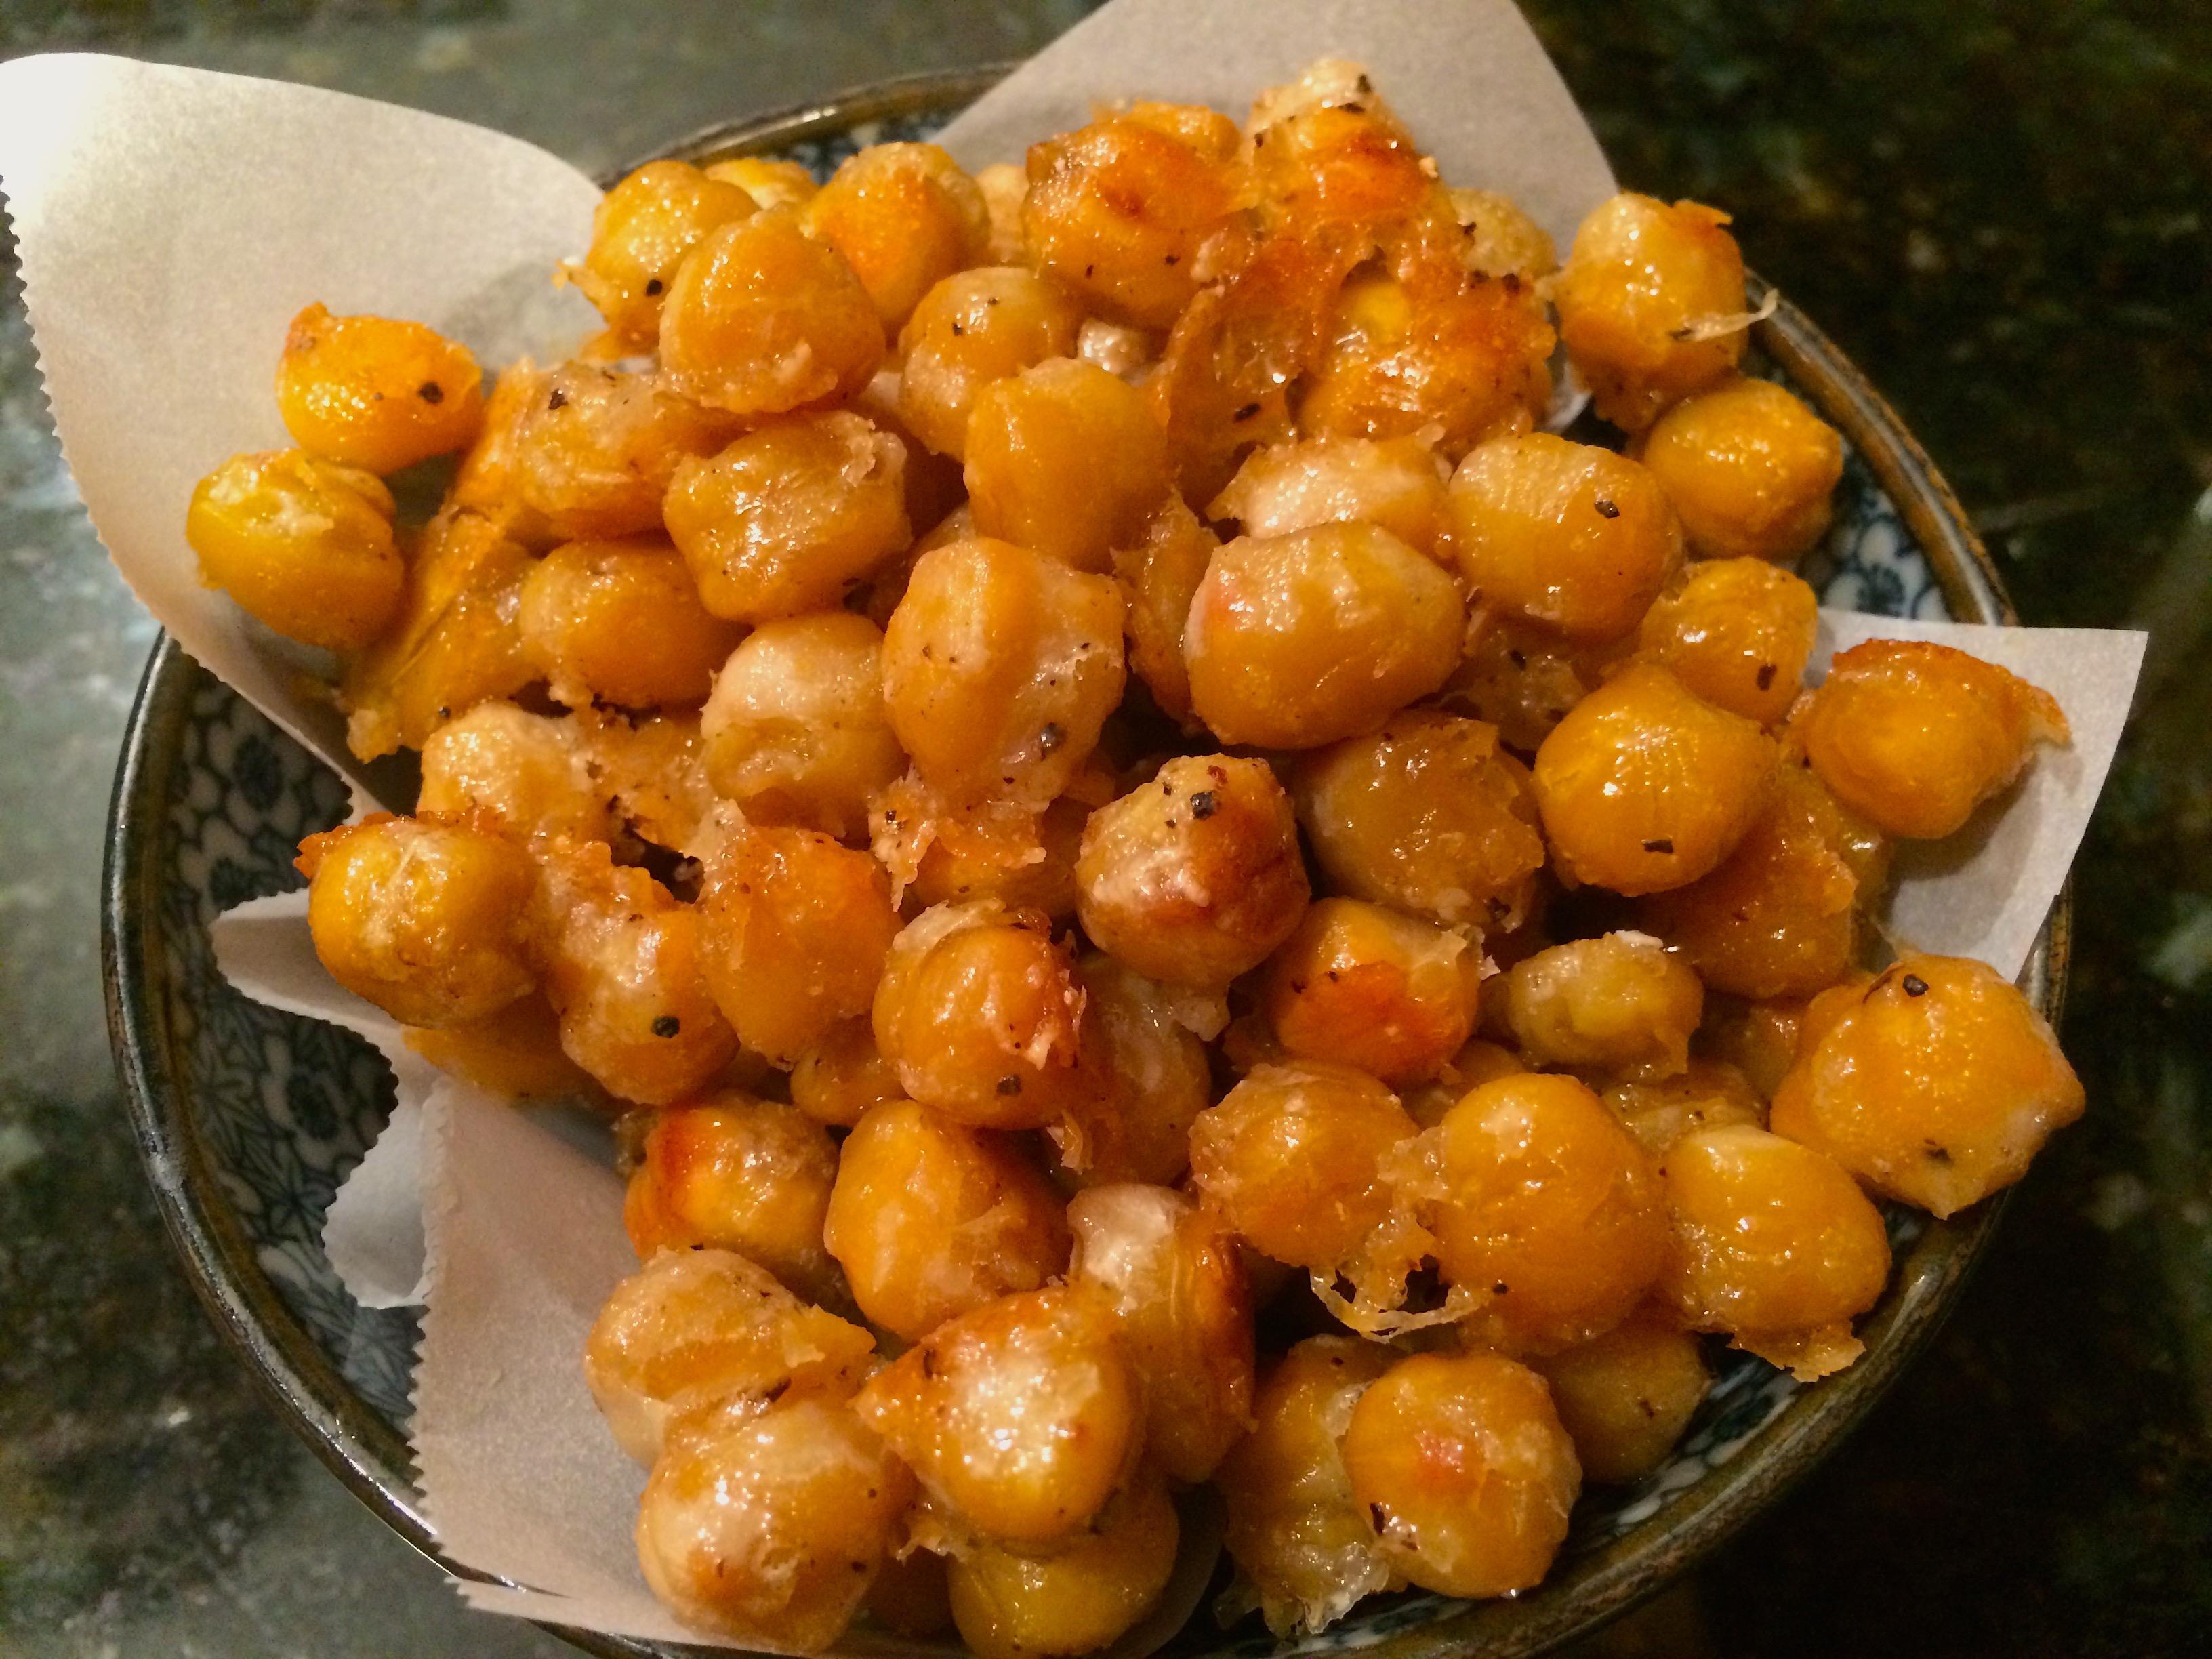 Parmesan chickpeas 1